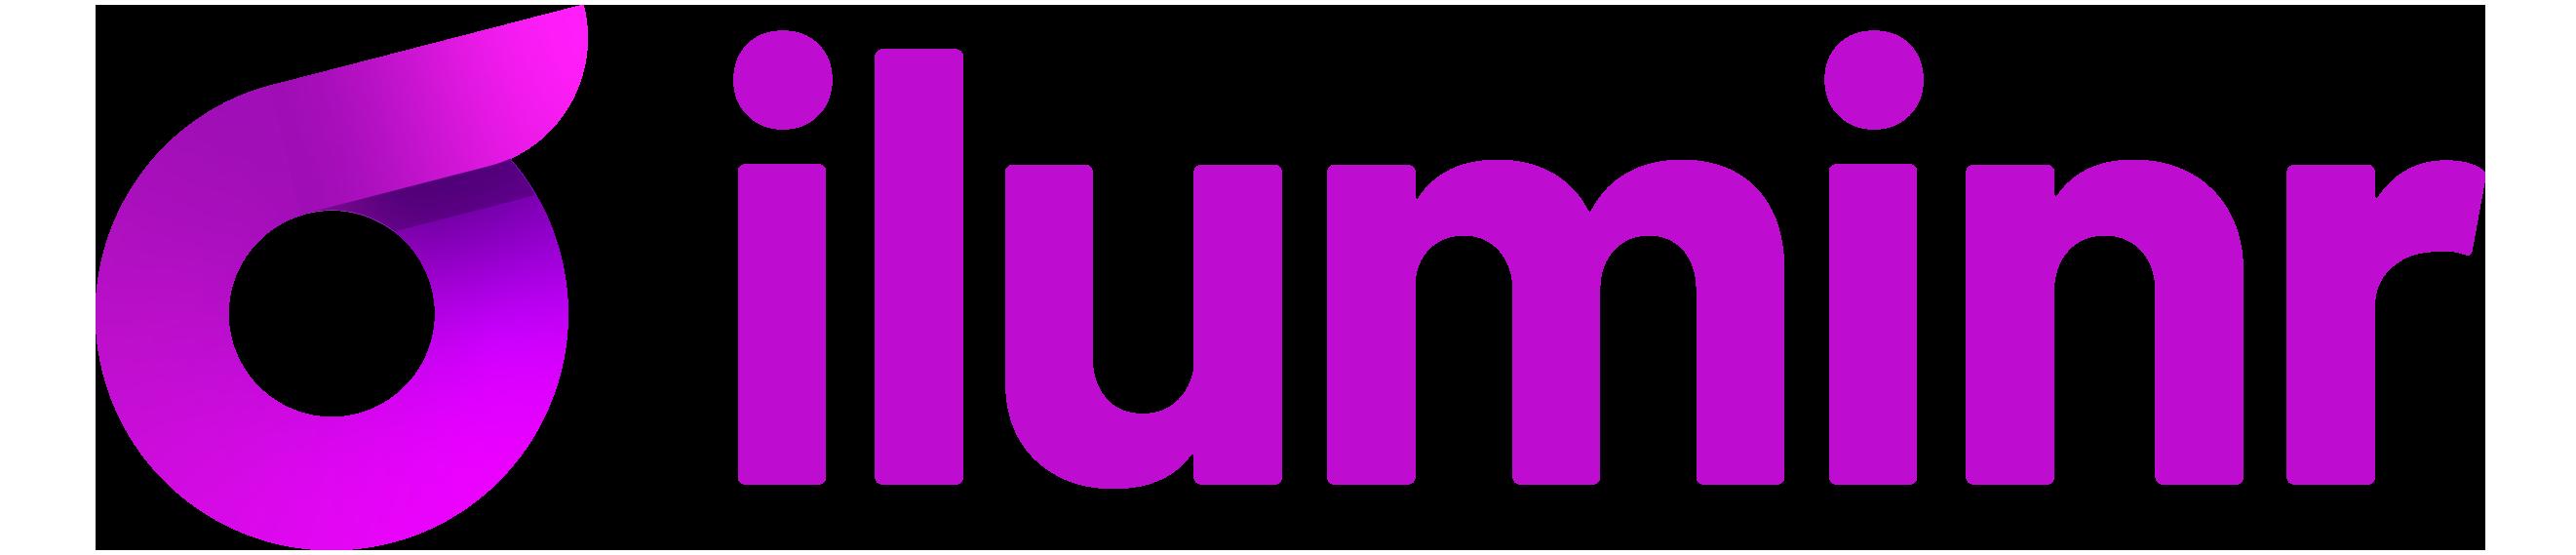 iluminr active threat monitoring